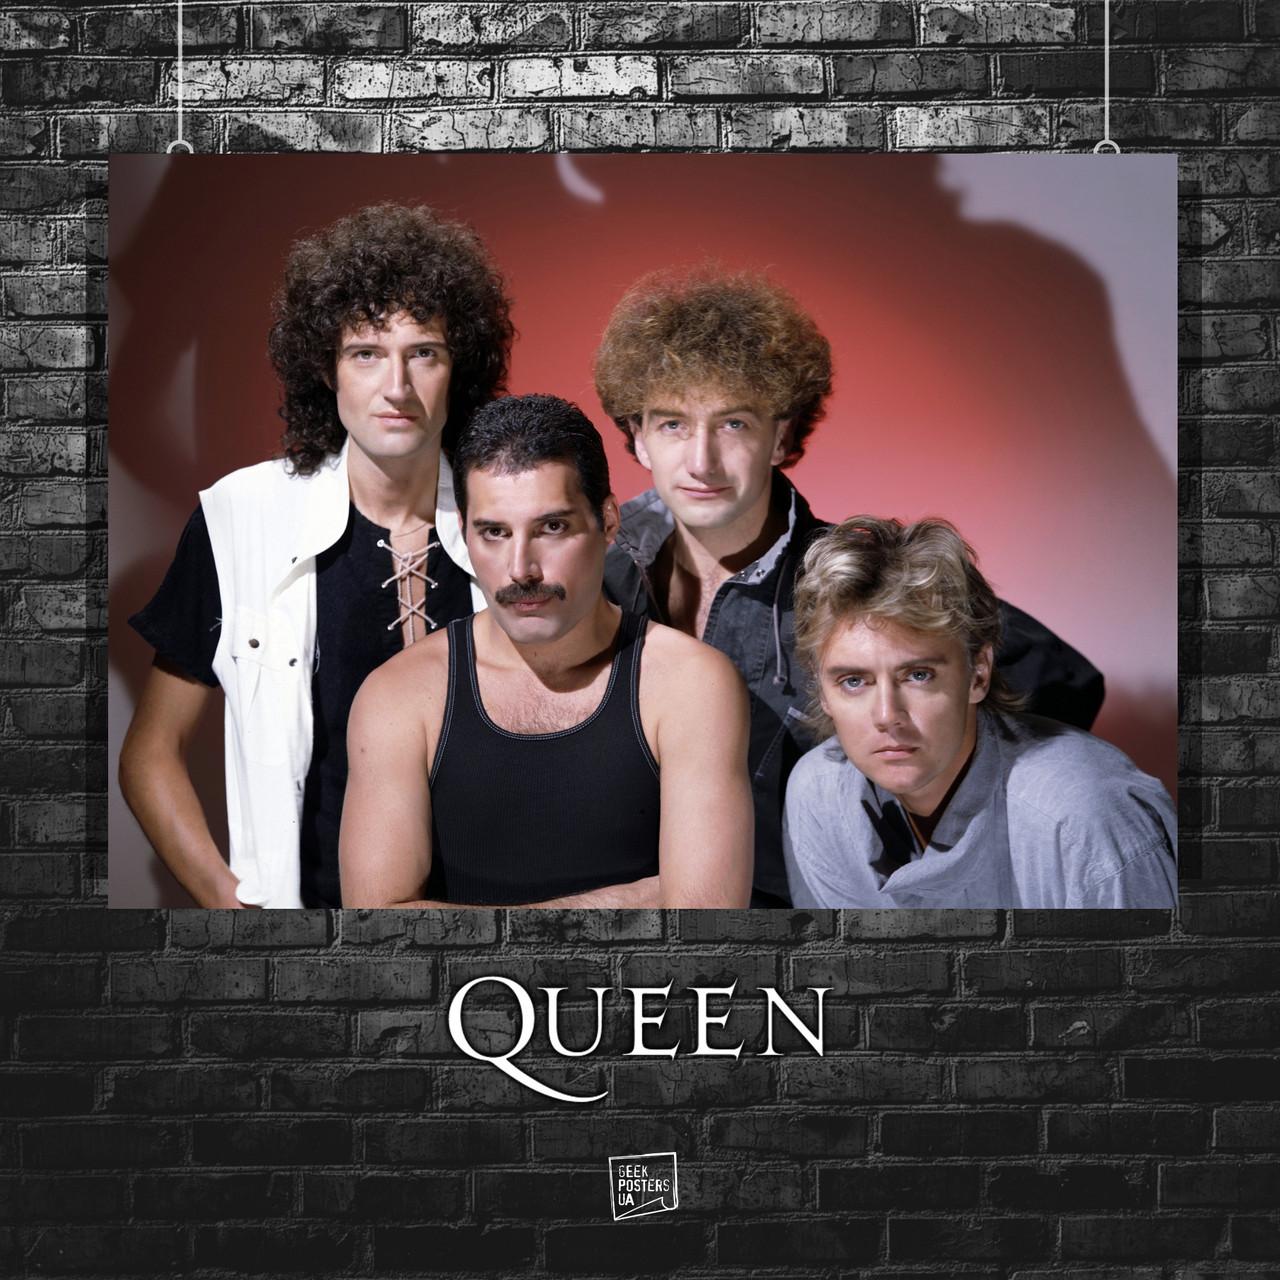 Постер Queen, Freddy Mercury, Квин, Фредди Меркьюри. Размер 60x42см (A2). Глянцевая бумага